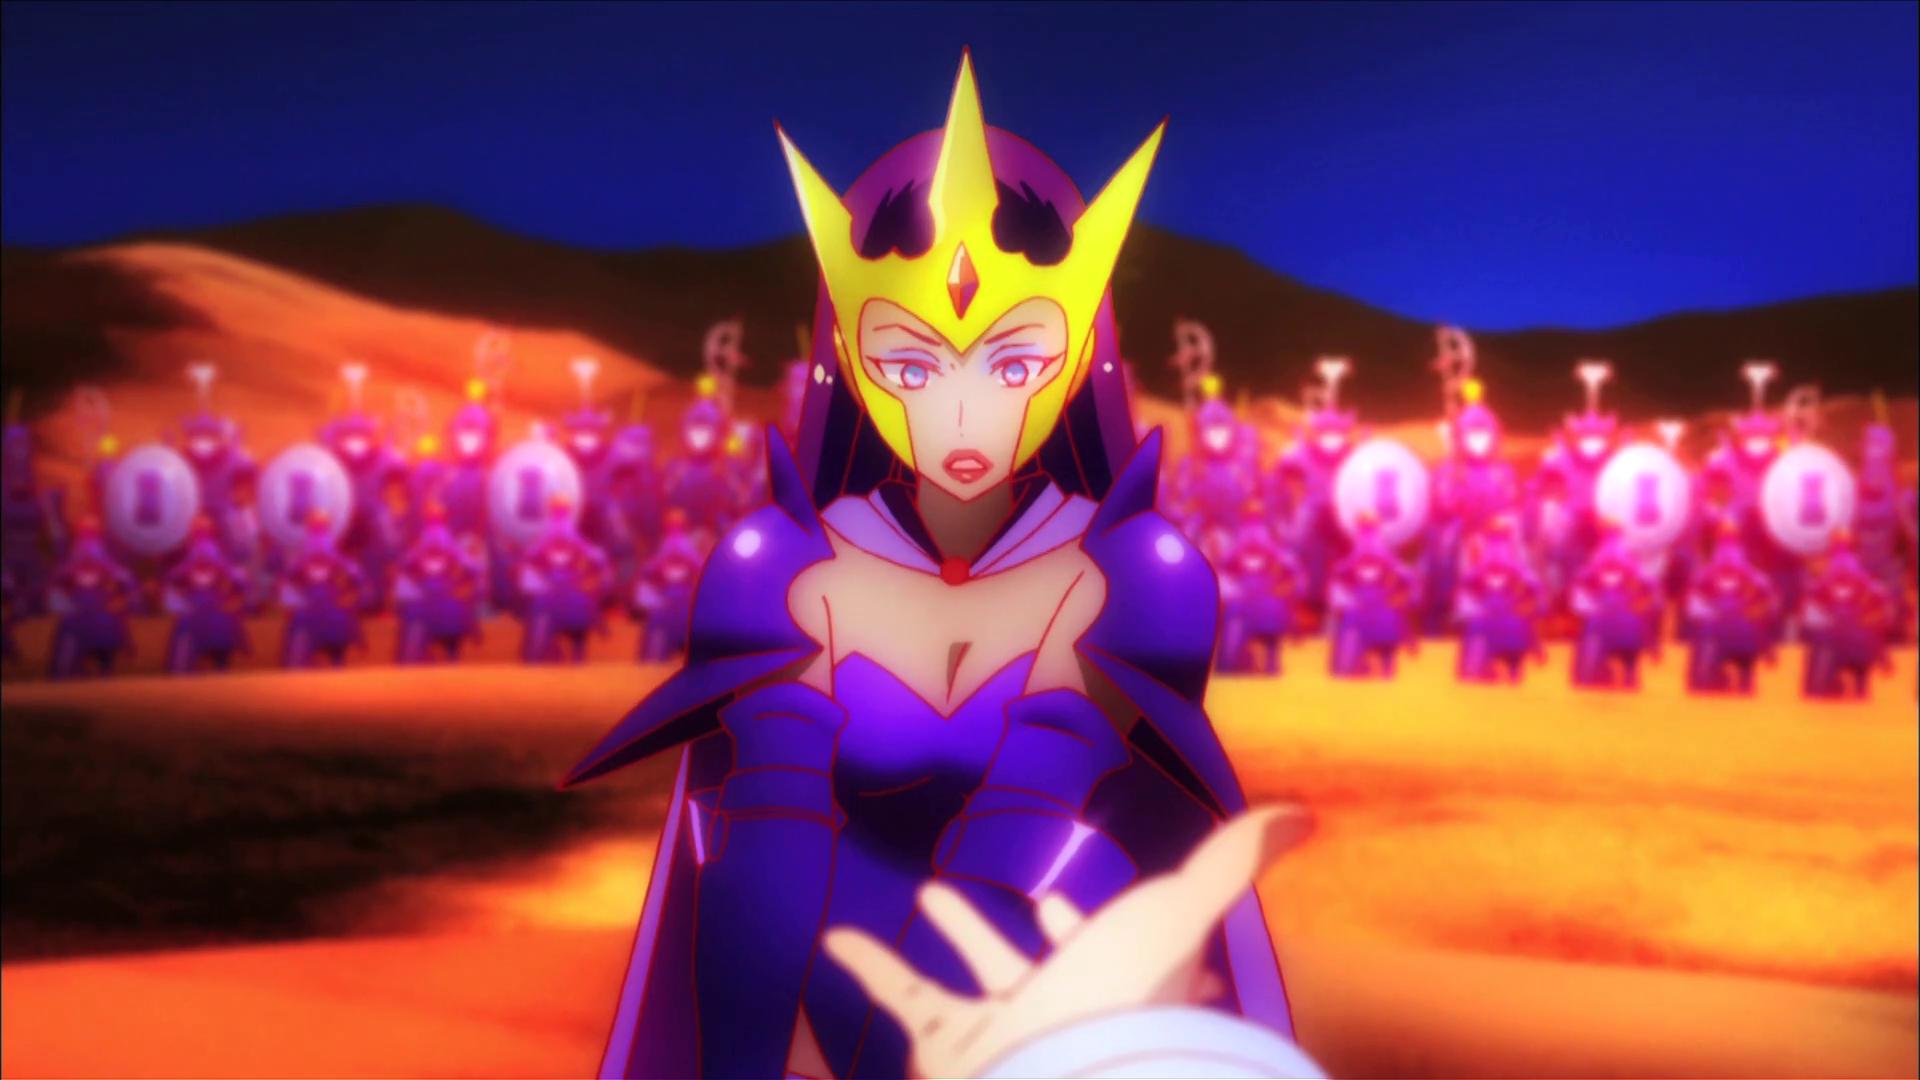 No Game No Life anime screen 2